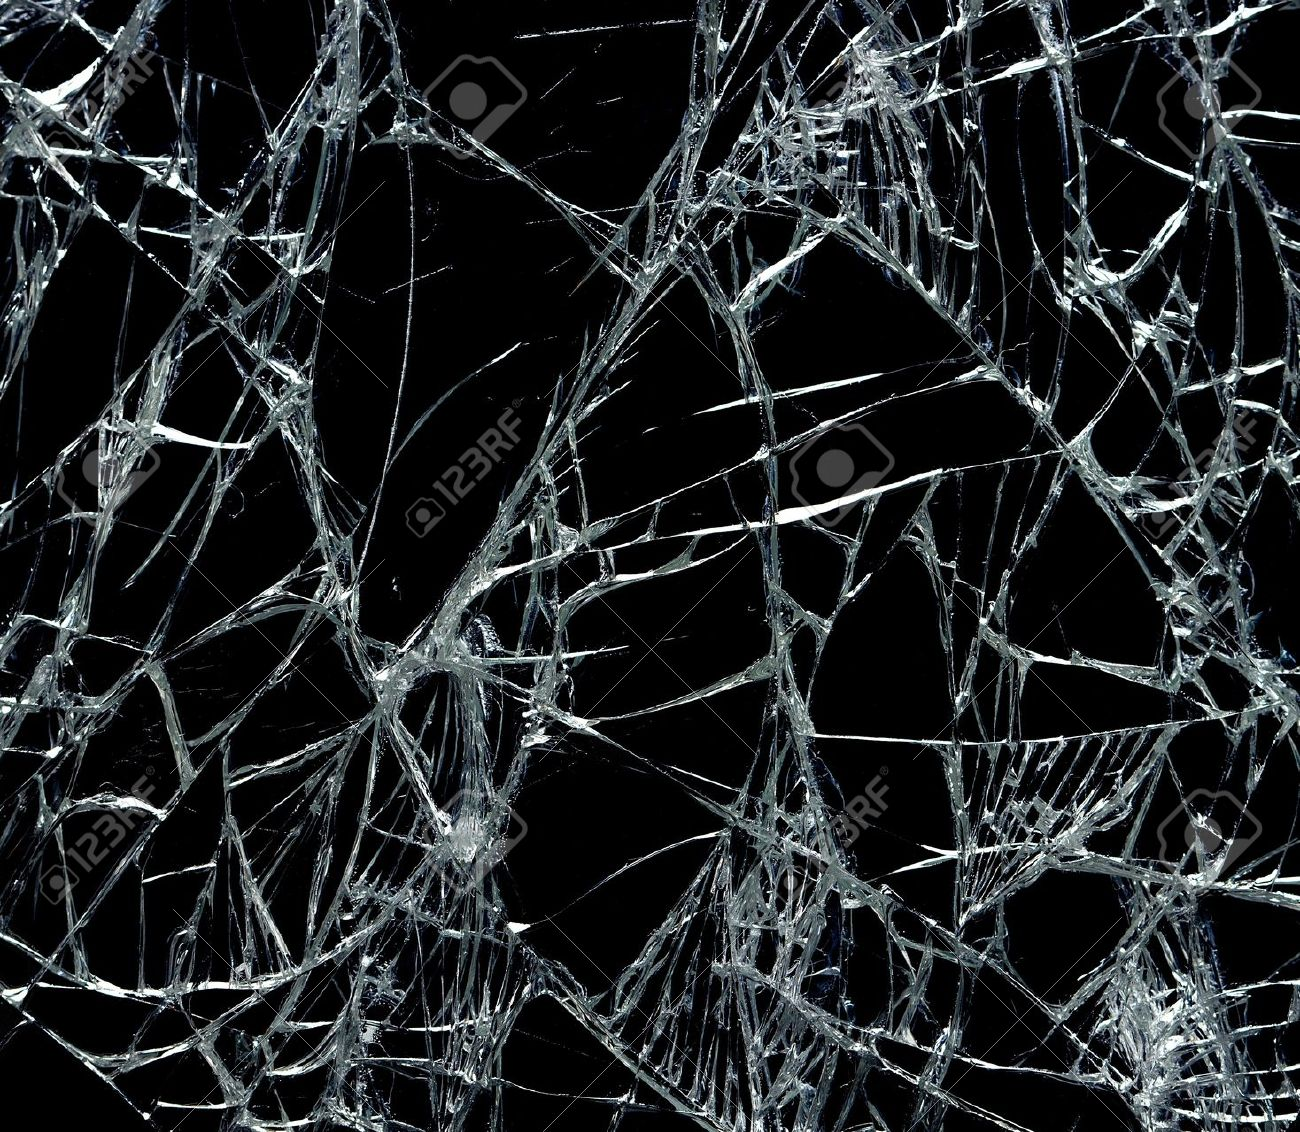 Broken glass over black background stock photo picture and royalty broken glass over black background stock photo 13322481 voltagebd Gallery